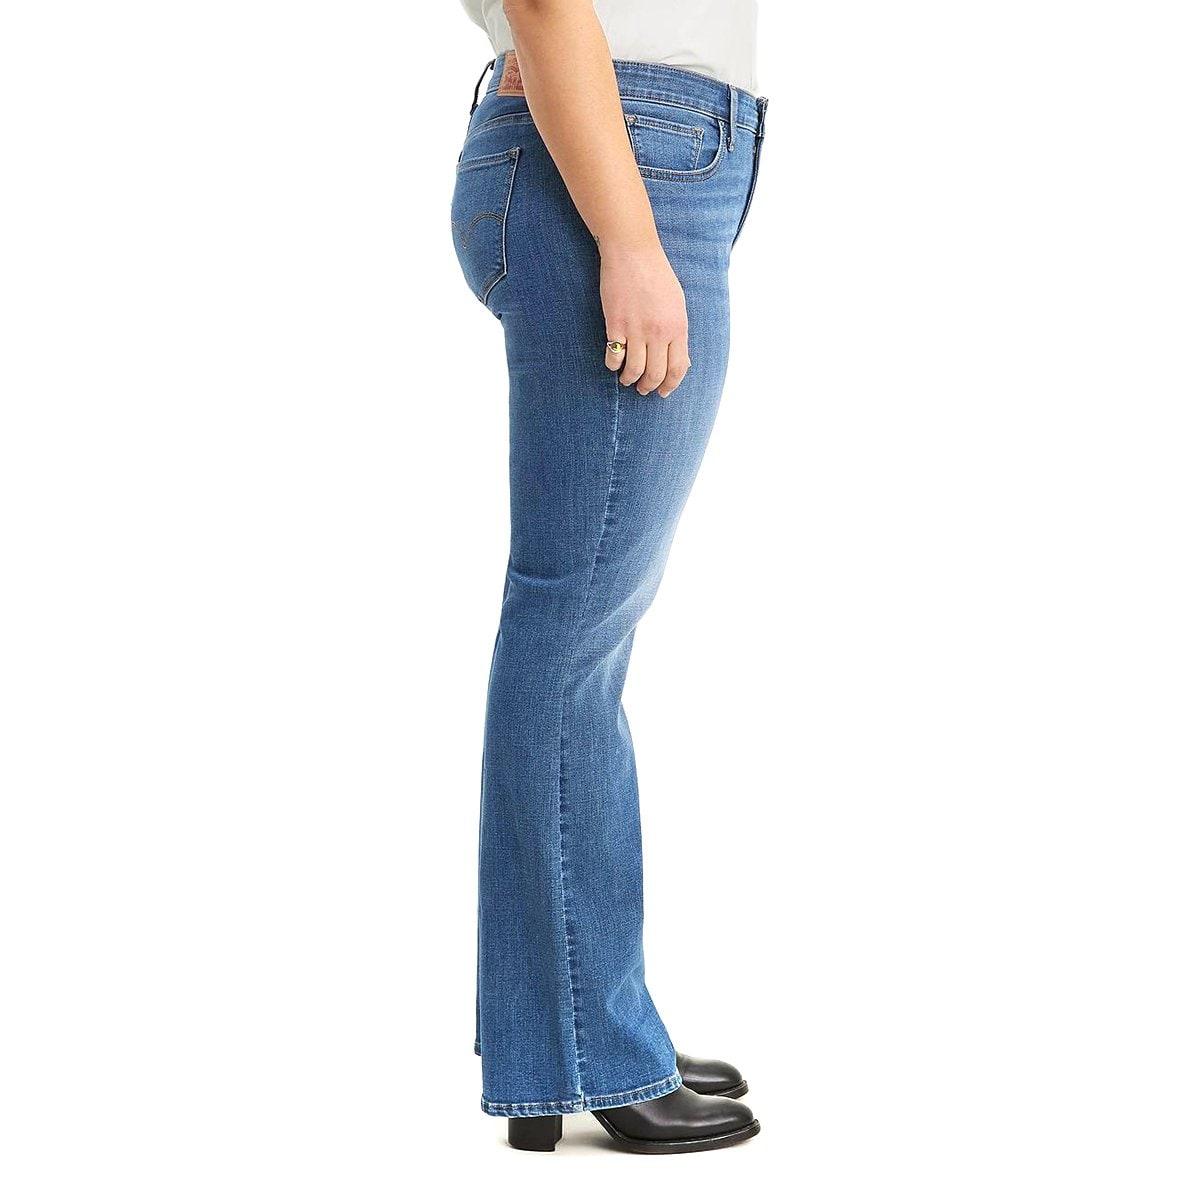 Jeans Bota Cintura Media Levis